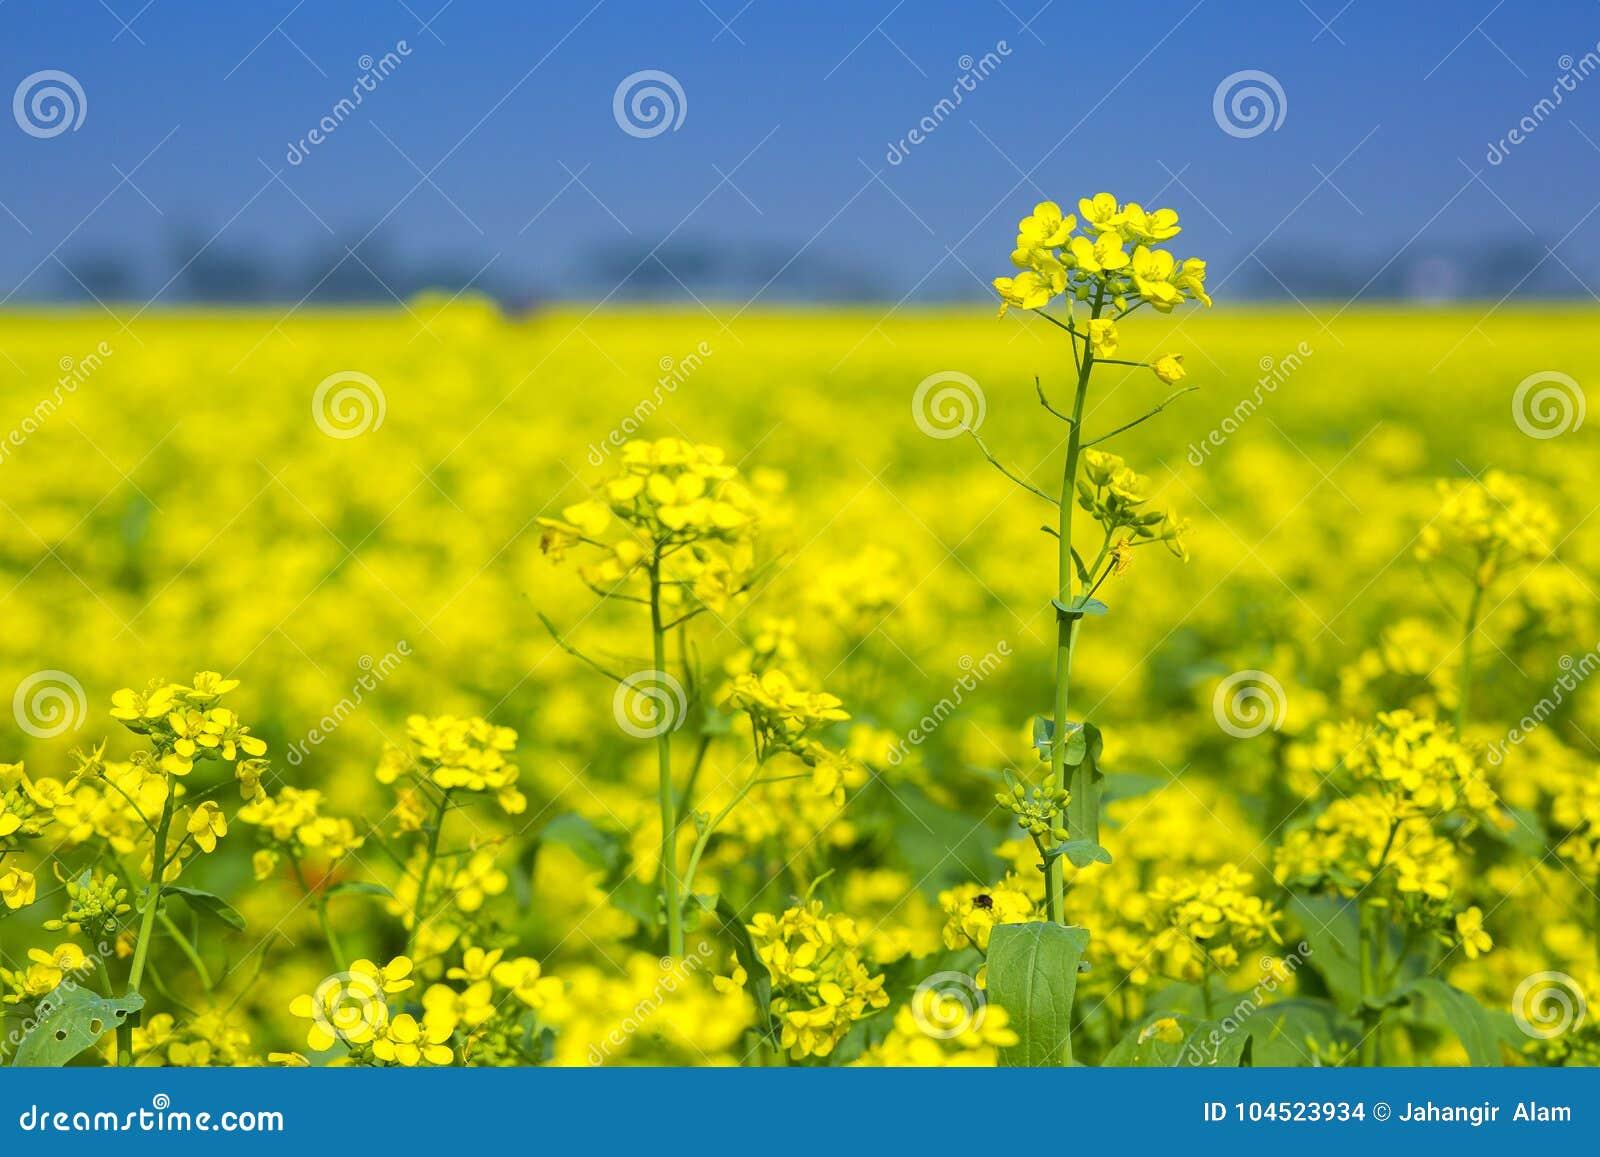 Mustard flower field is full blooming stock photo image of flower download comp mightylinksfo